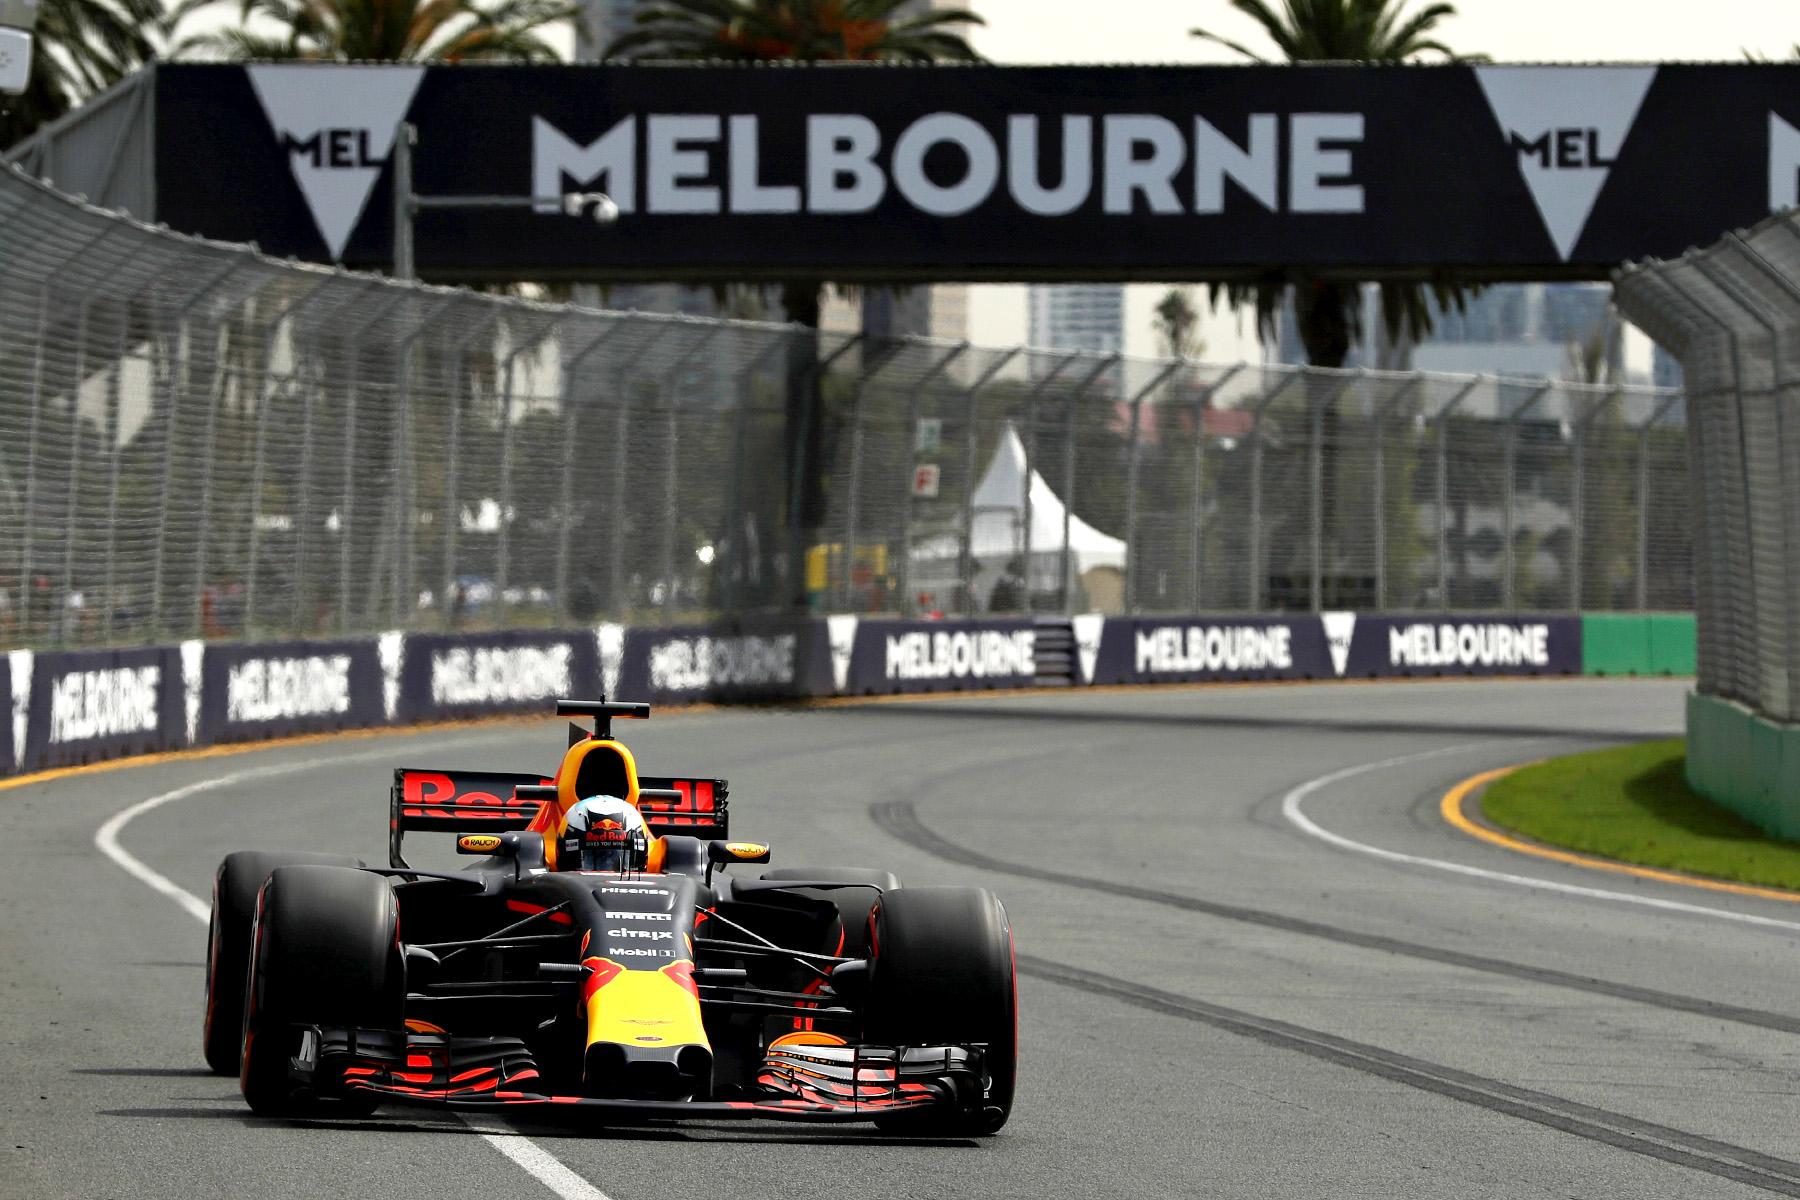 Daniel Ricciardo on track at the 2017 Australian Grand Prix.